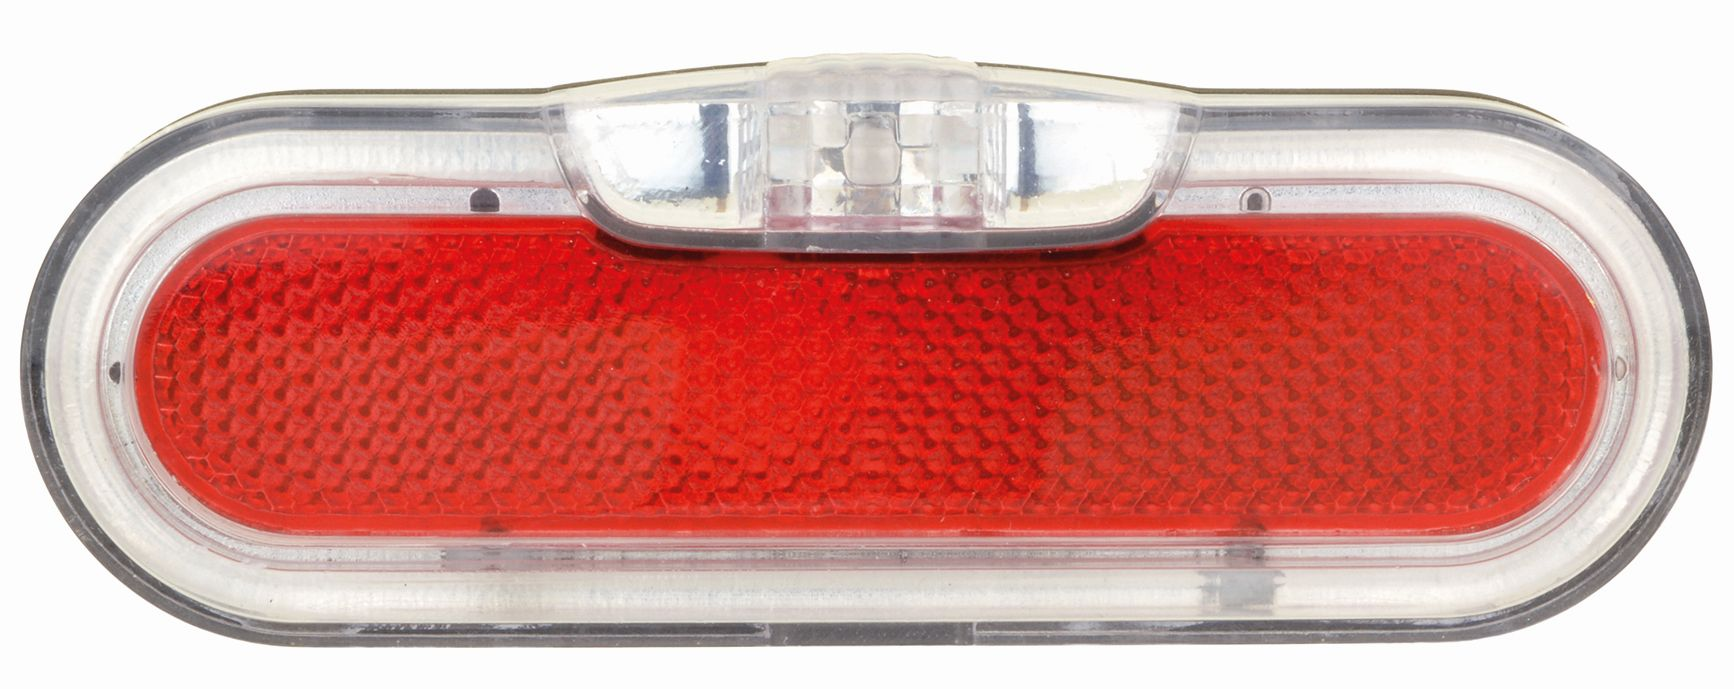 Fuxon LED-Rücklicht 80mm R 121 EB 6-12 V